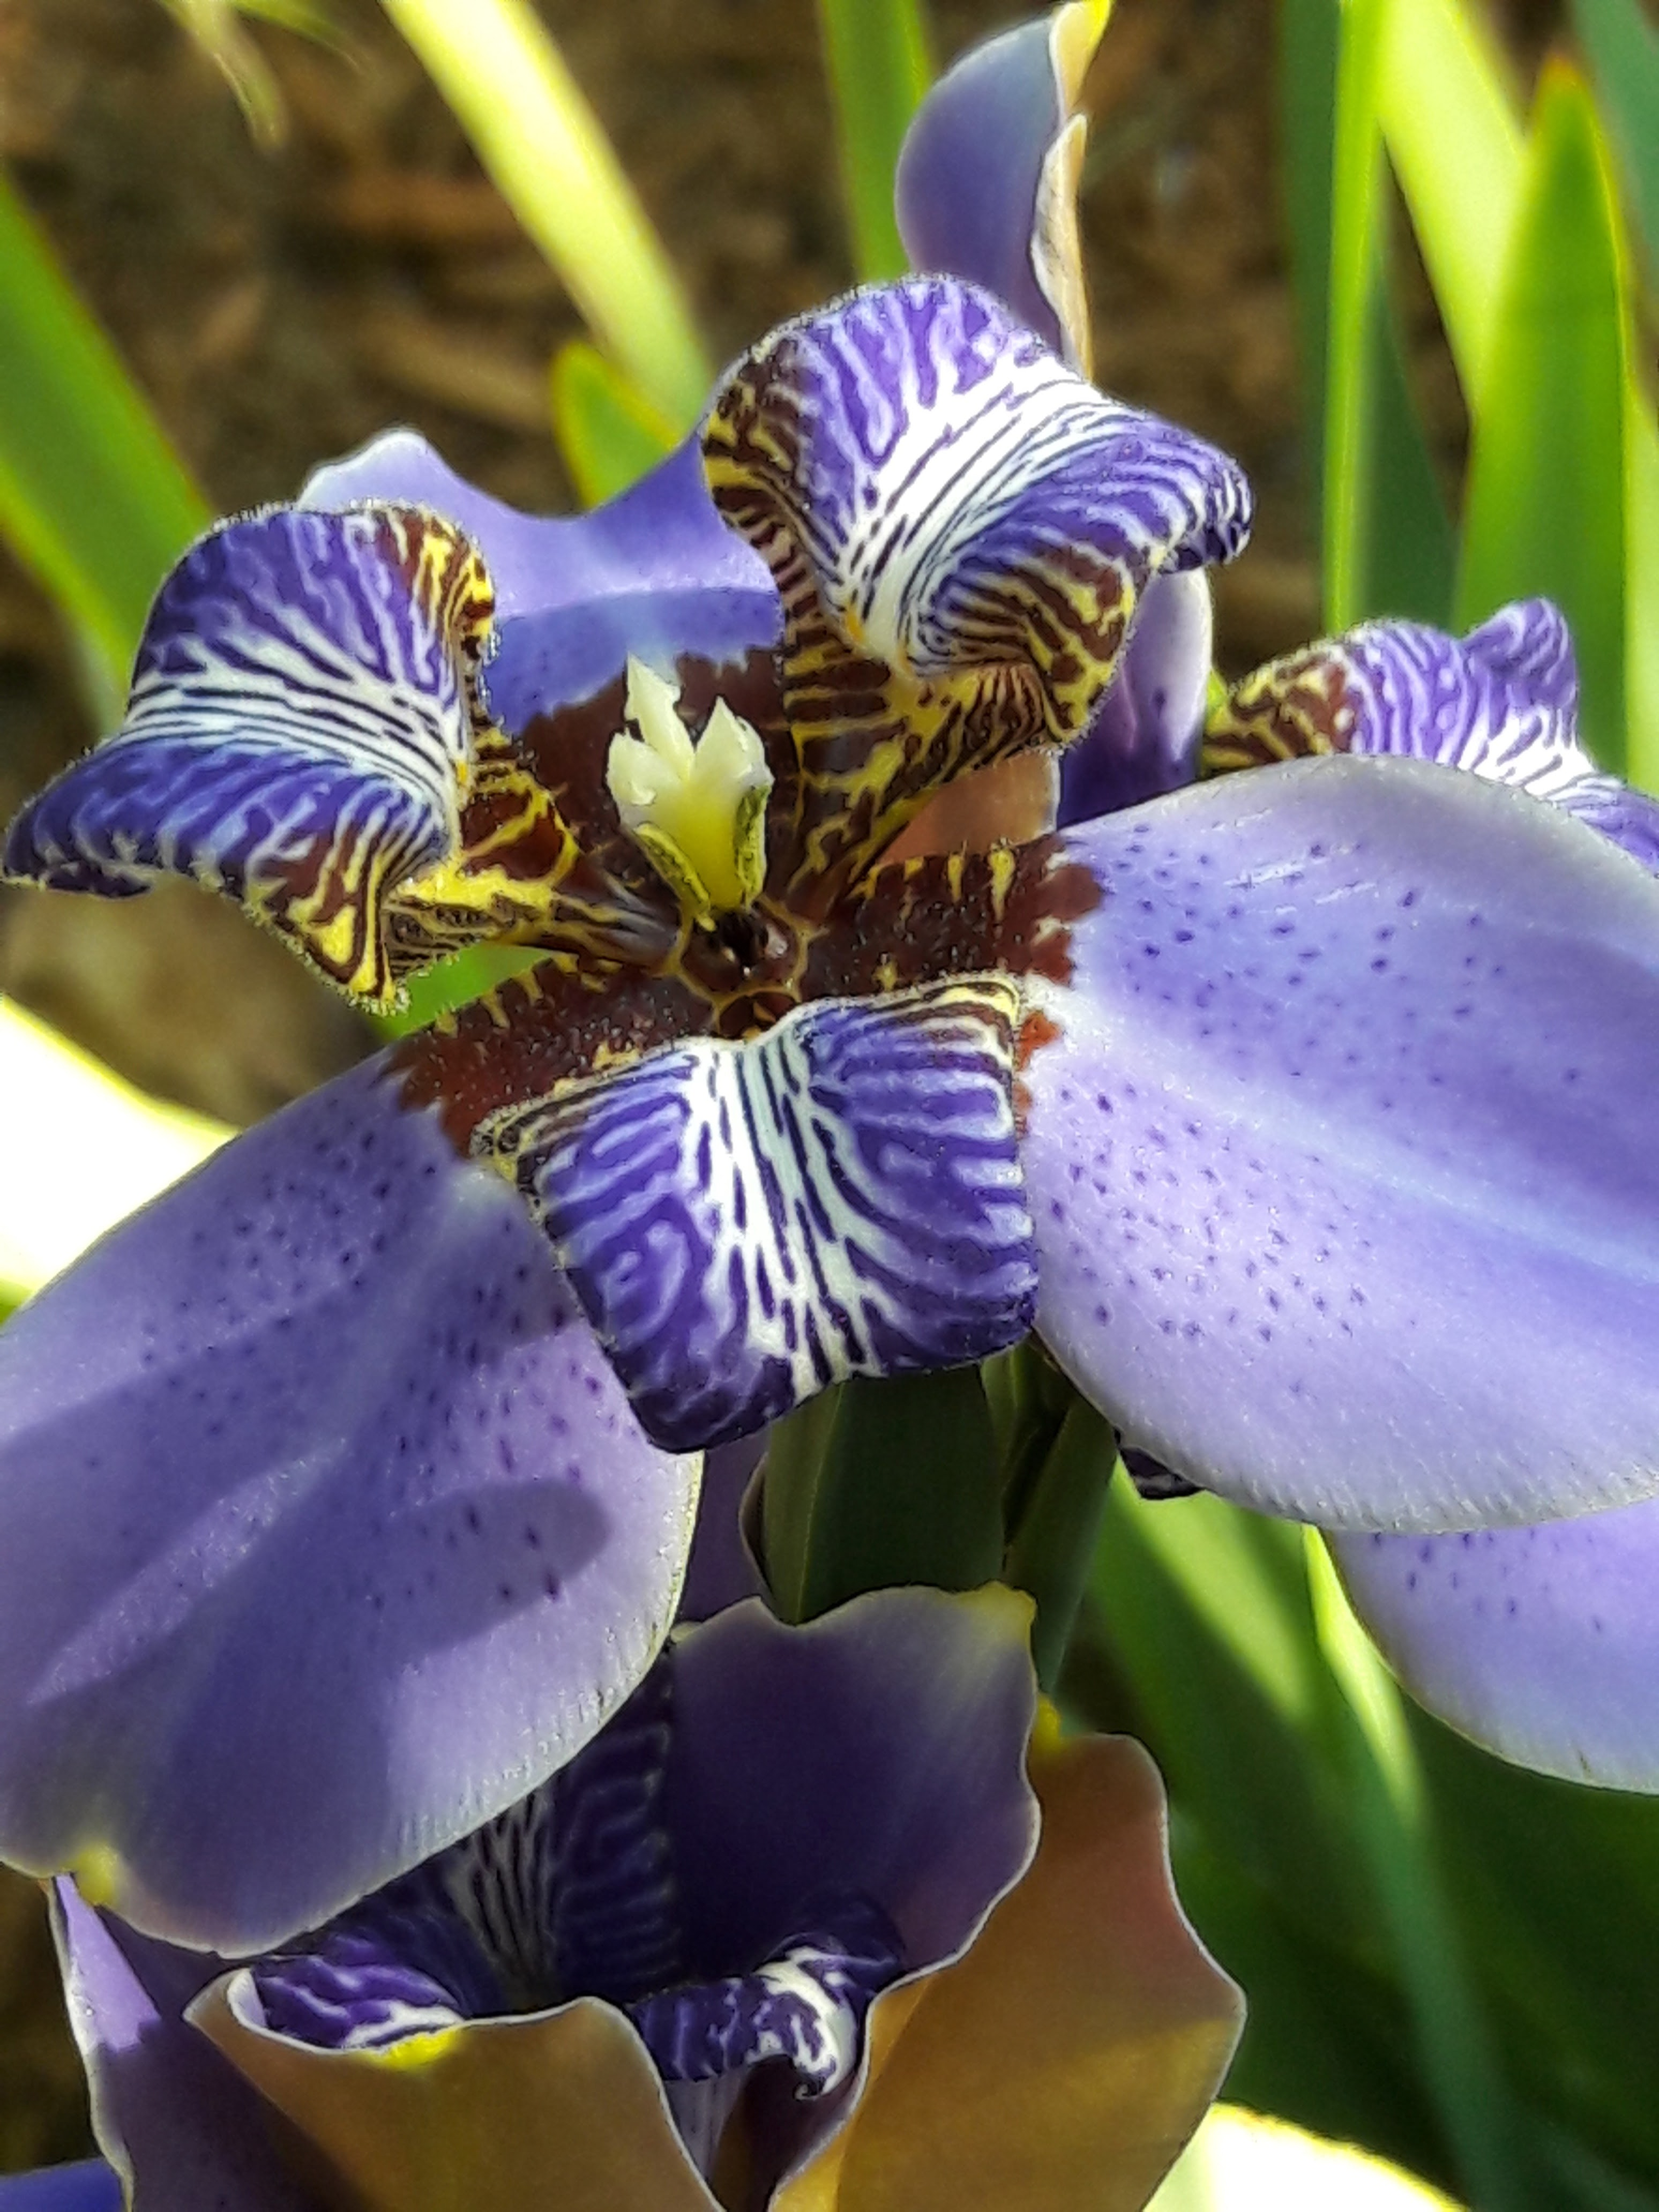 Free stock photo of flower iris nature free download izmirmasajfo Images